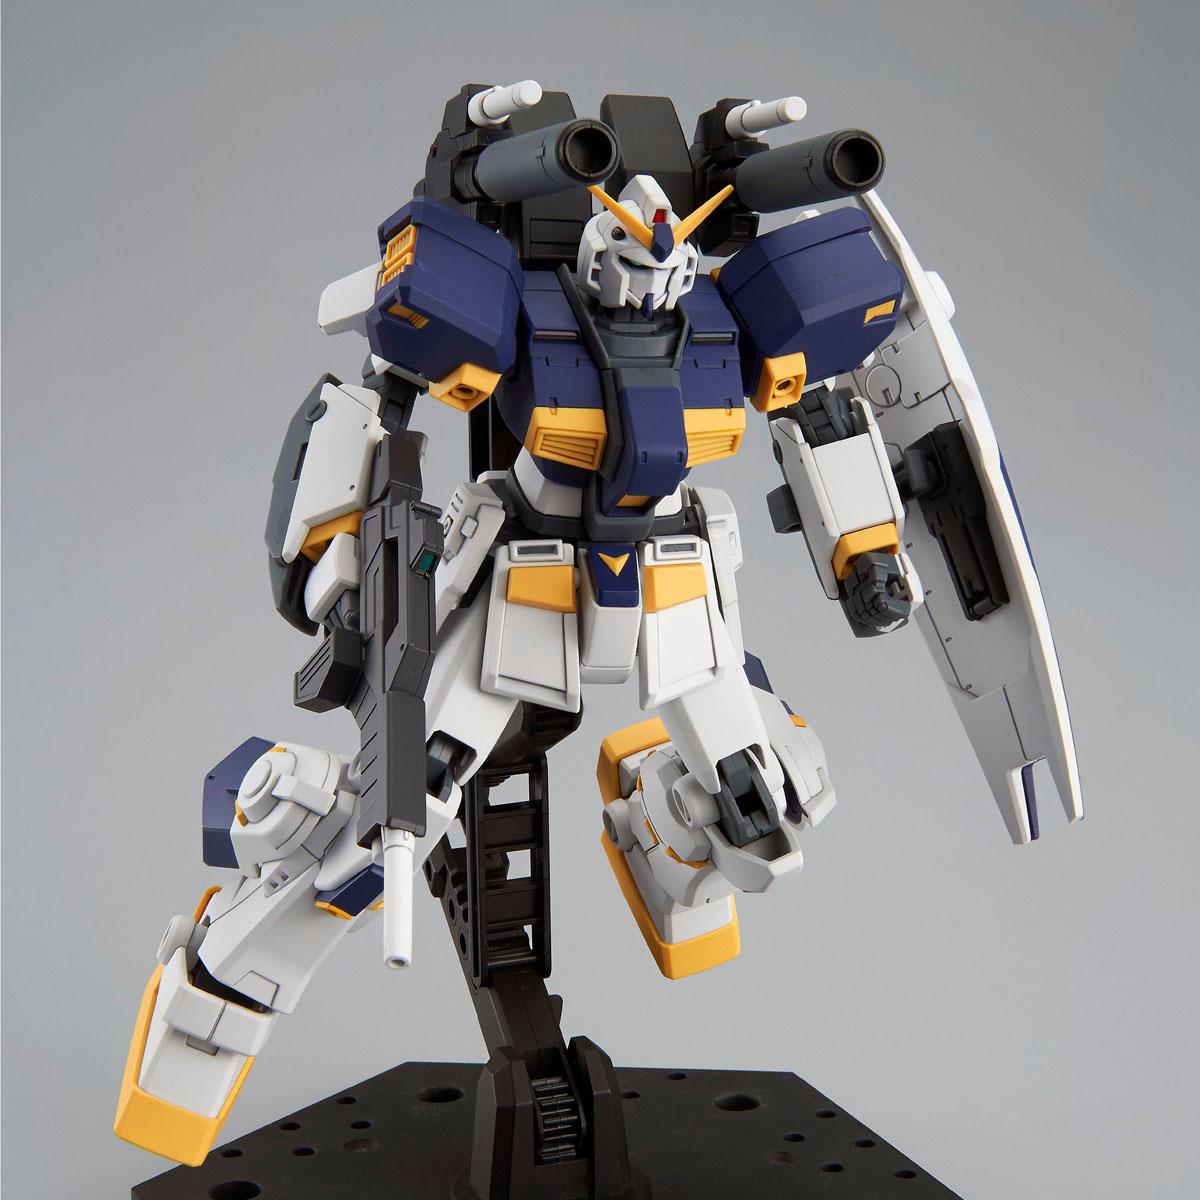 HG 1/144 GUNDAM G06 (MUDROCK) [Feb 2020 Delivery]